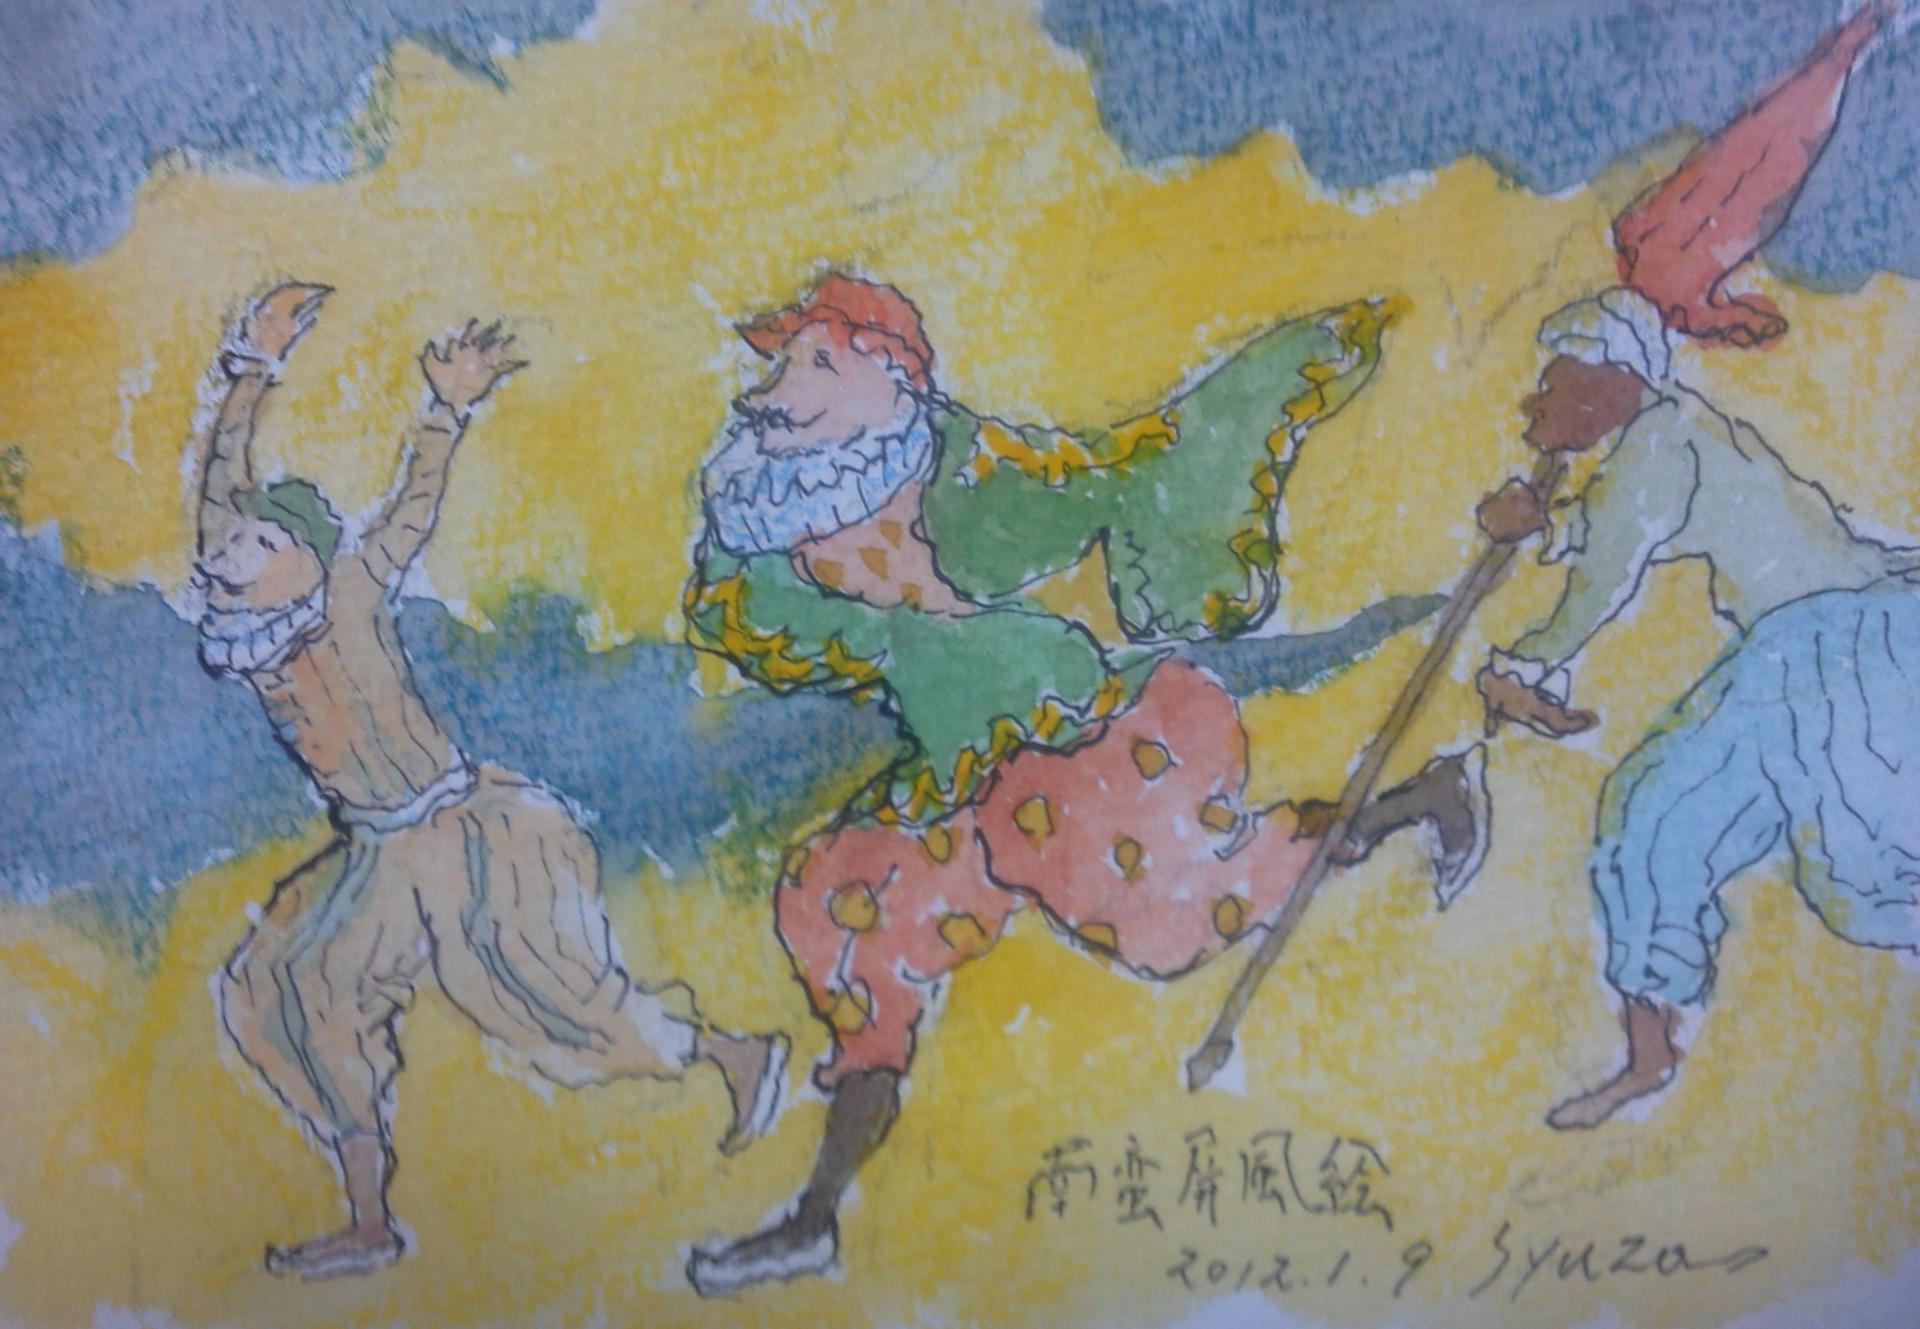 狩野内膳の画像 p1_20